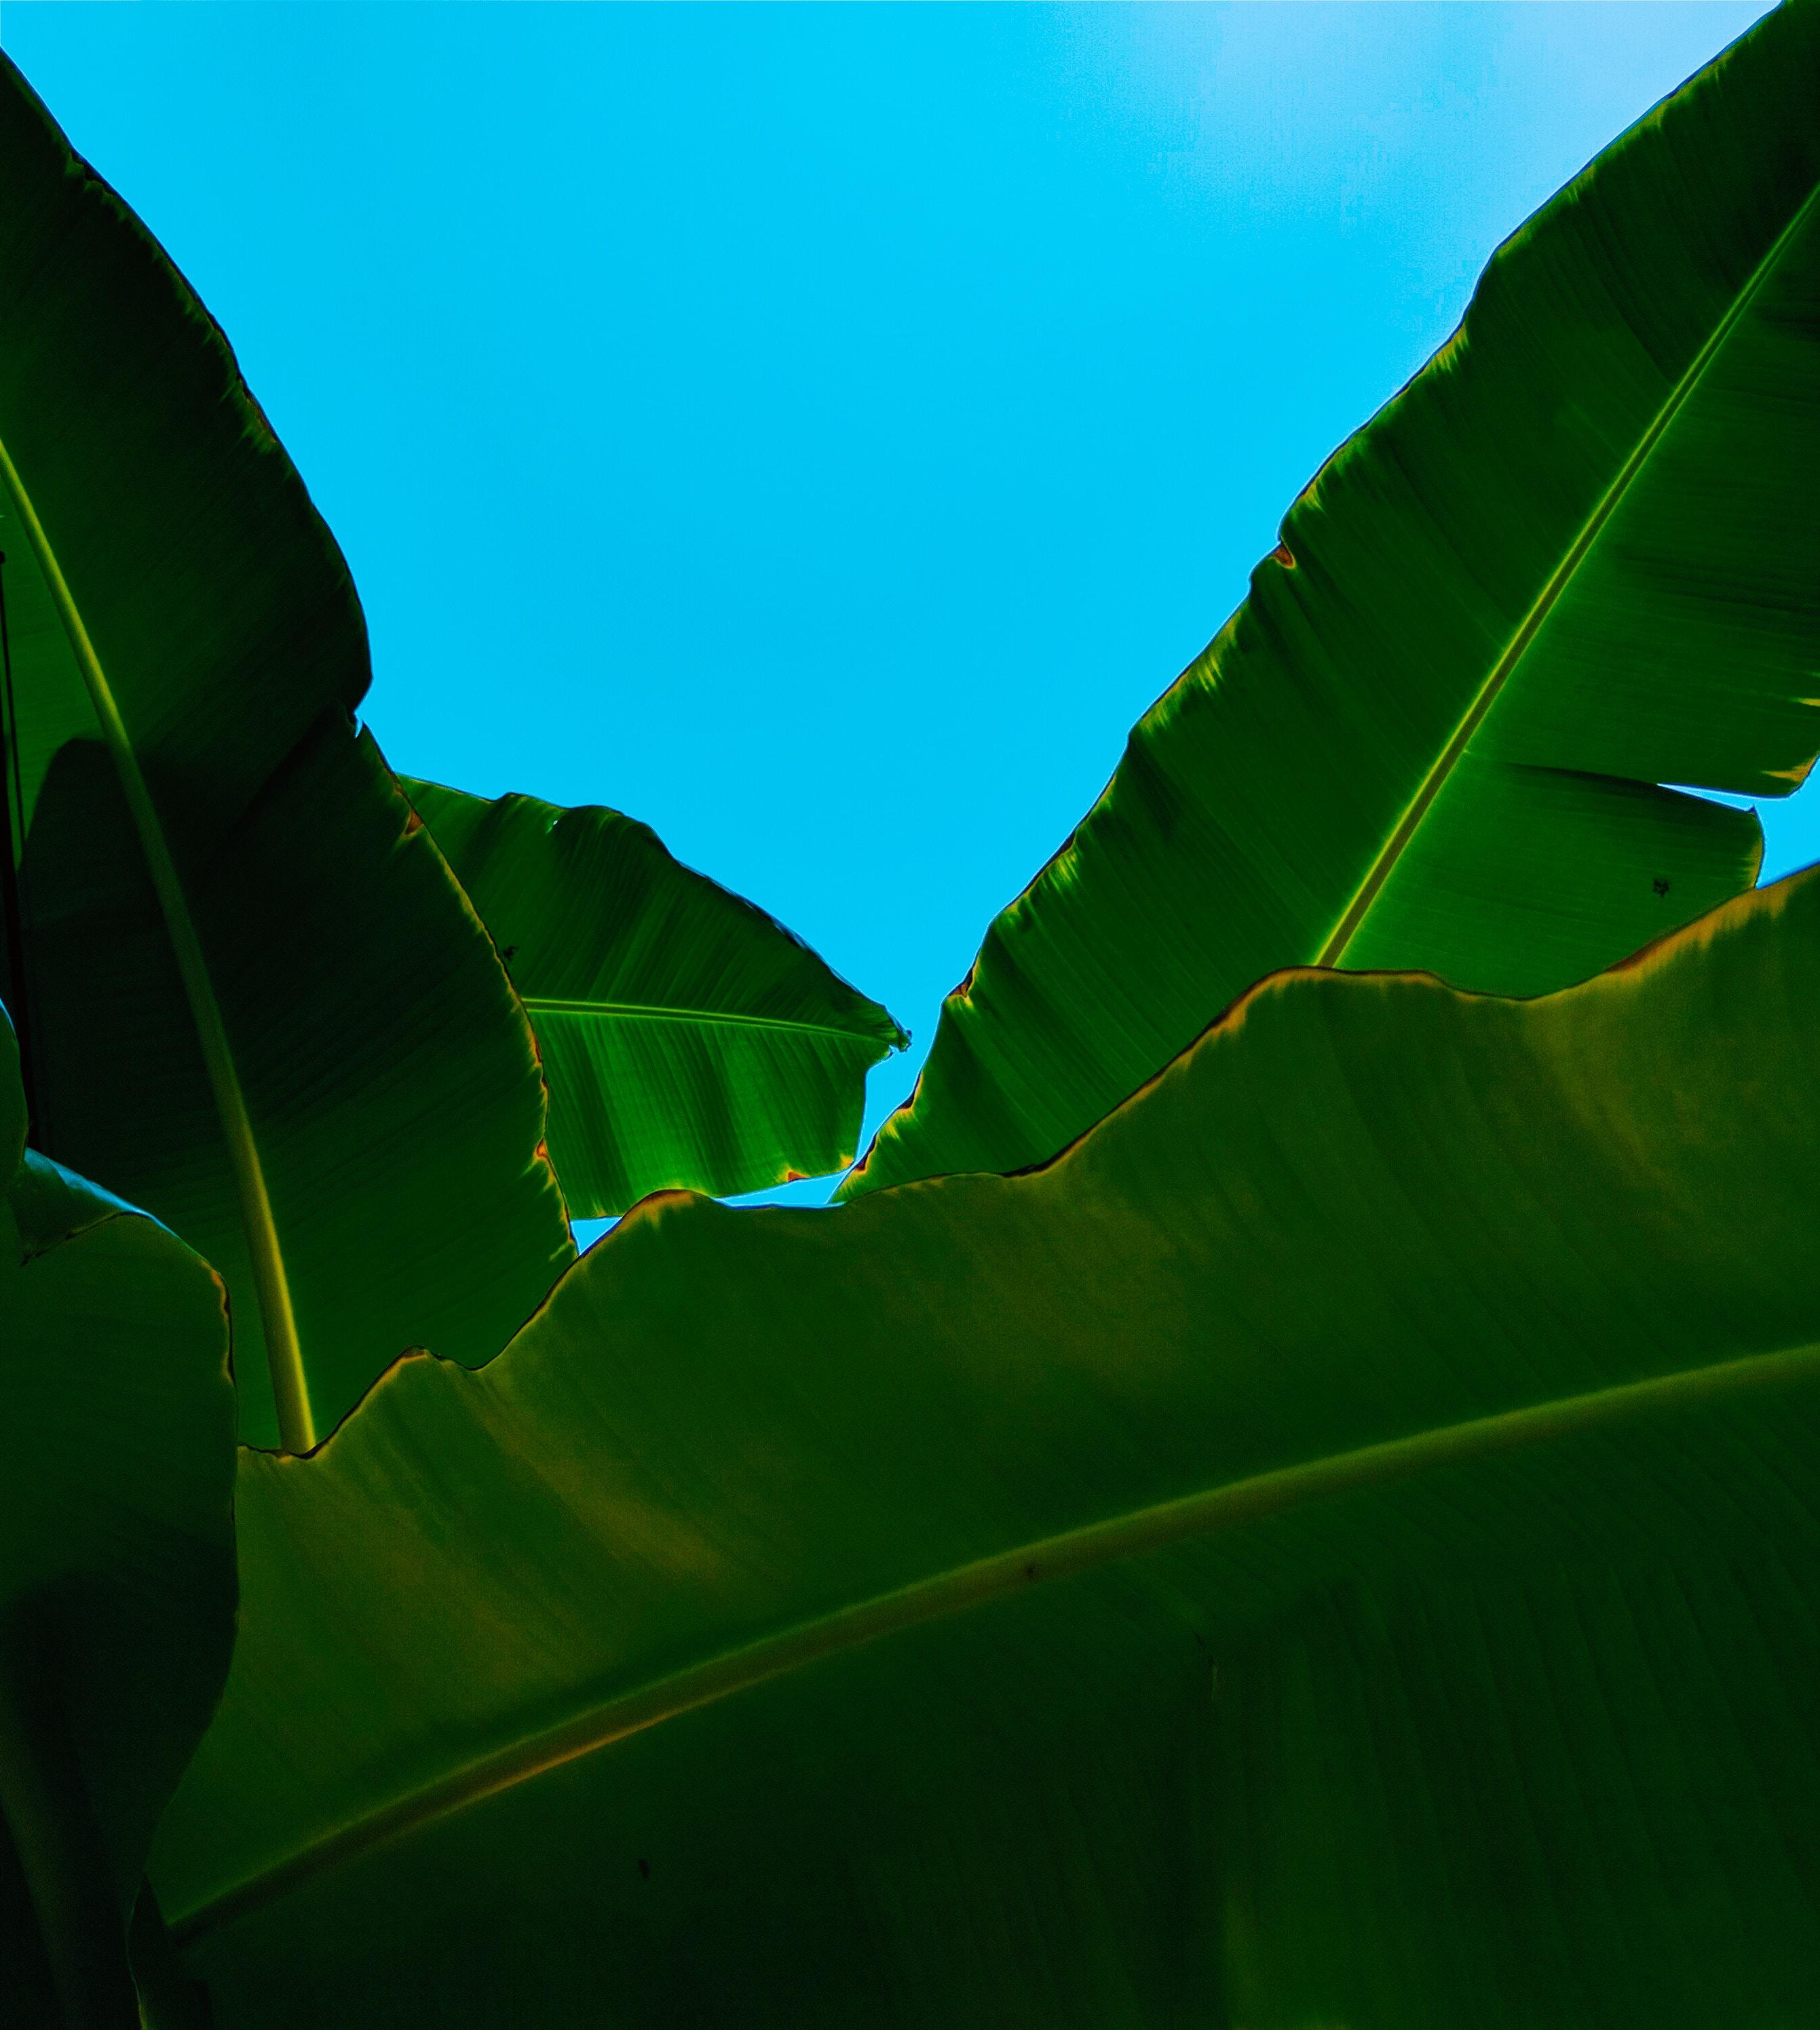 worms-eye-view of banana leaves